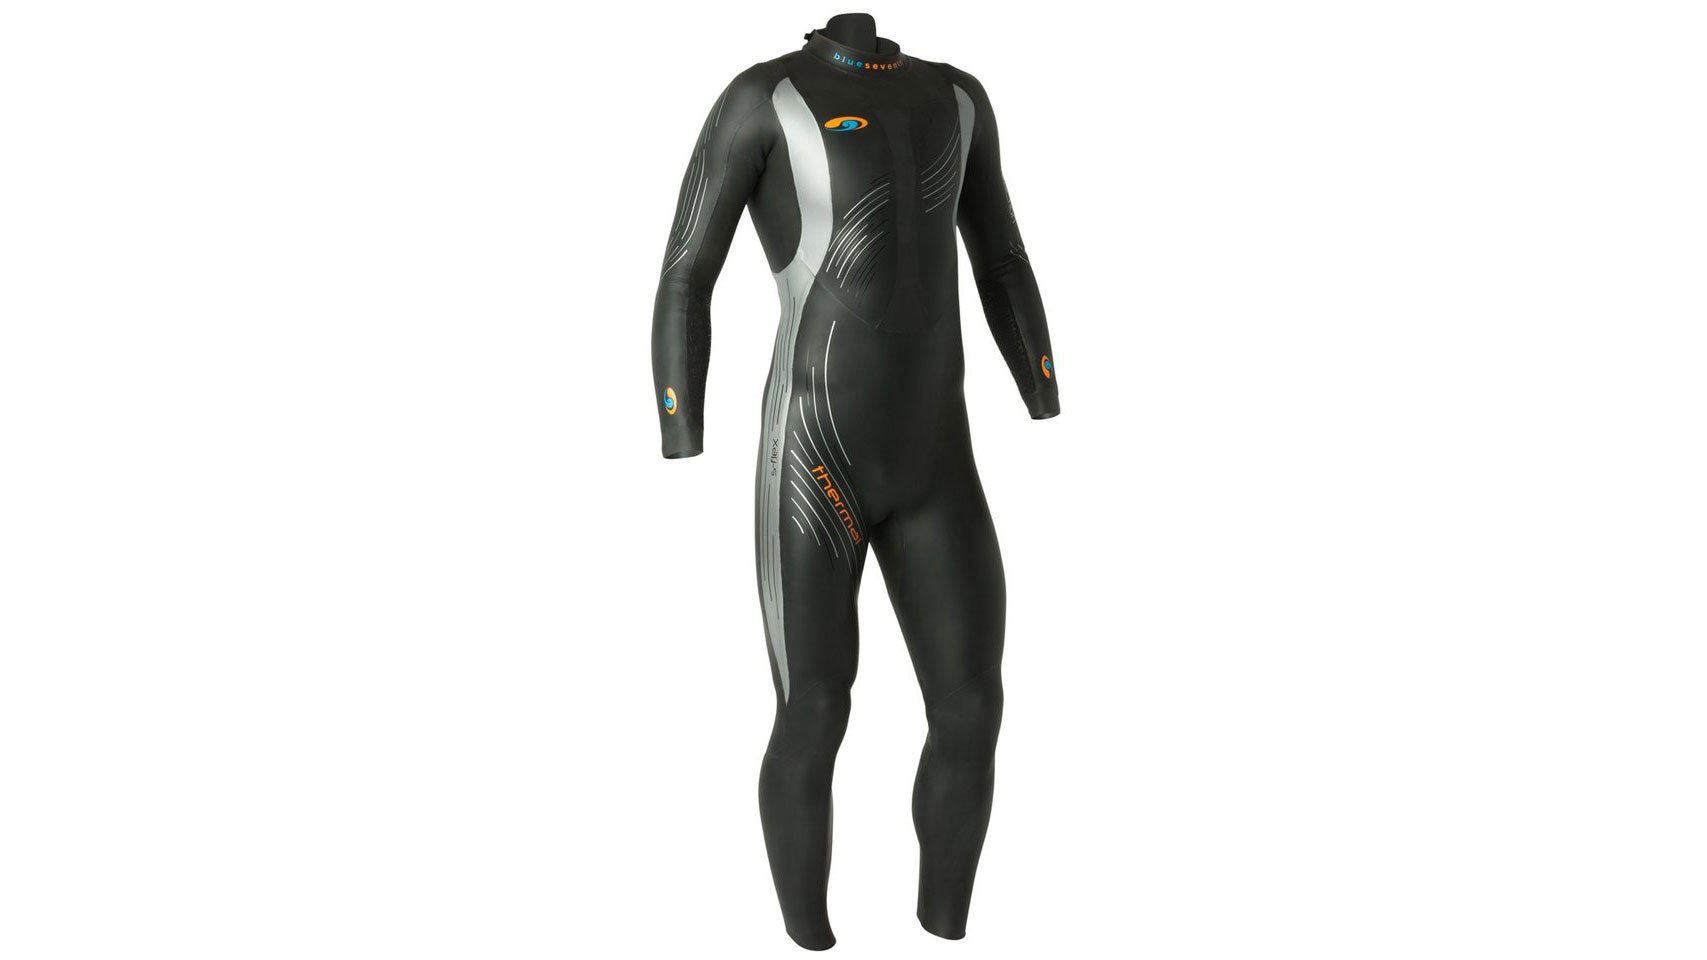 Men's Triathlon Wetsuit